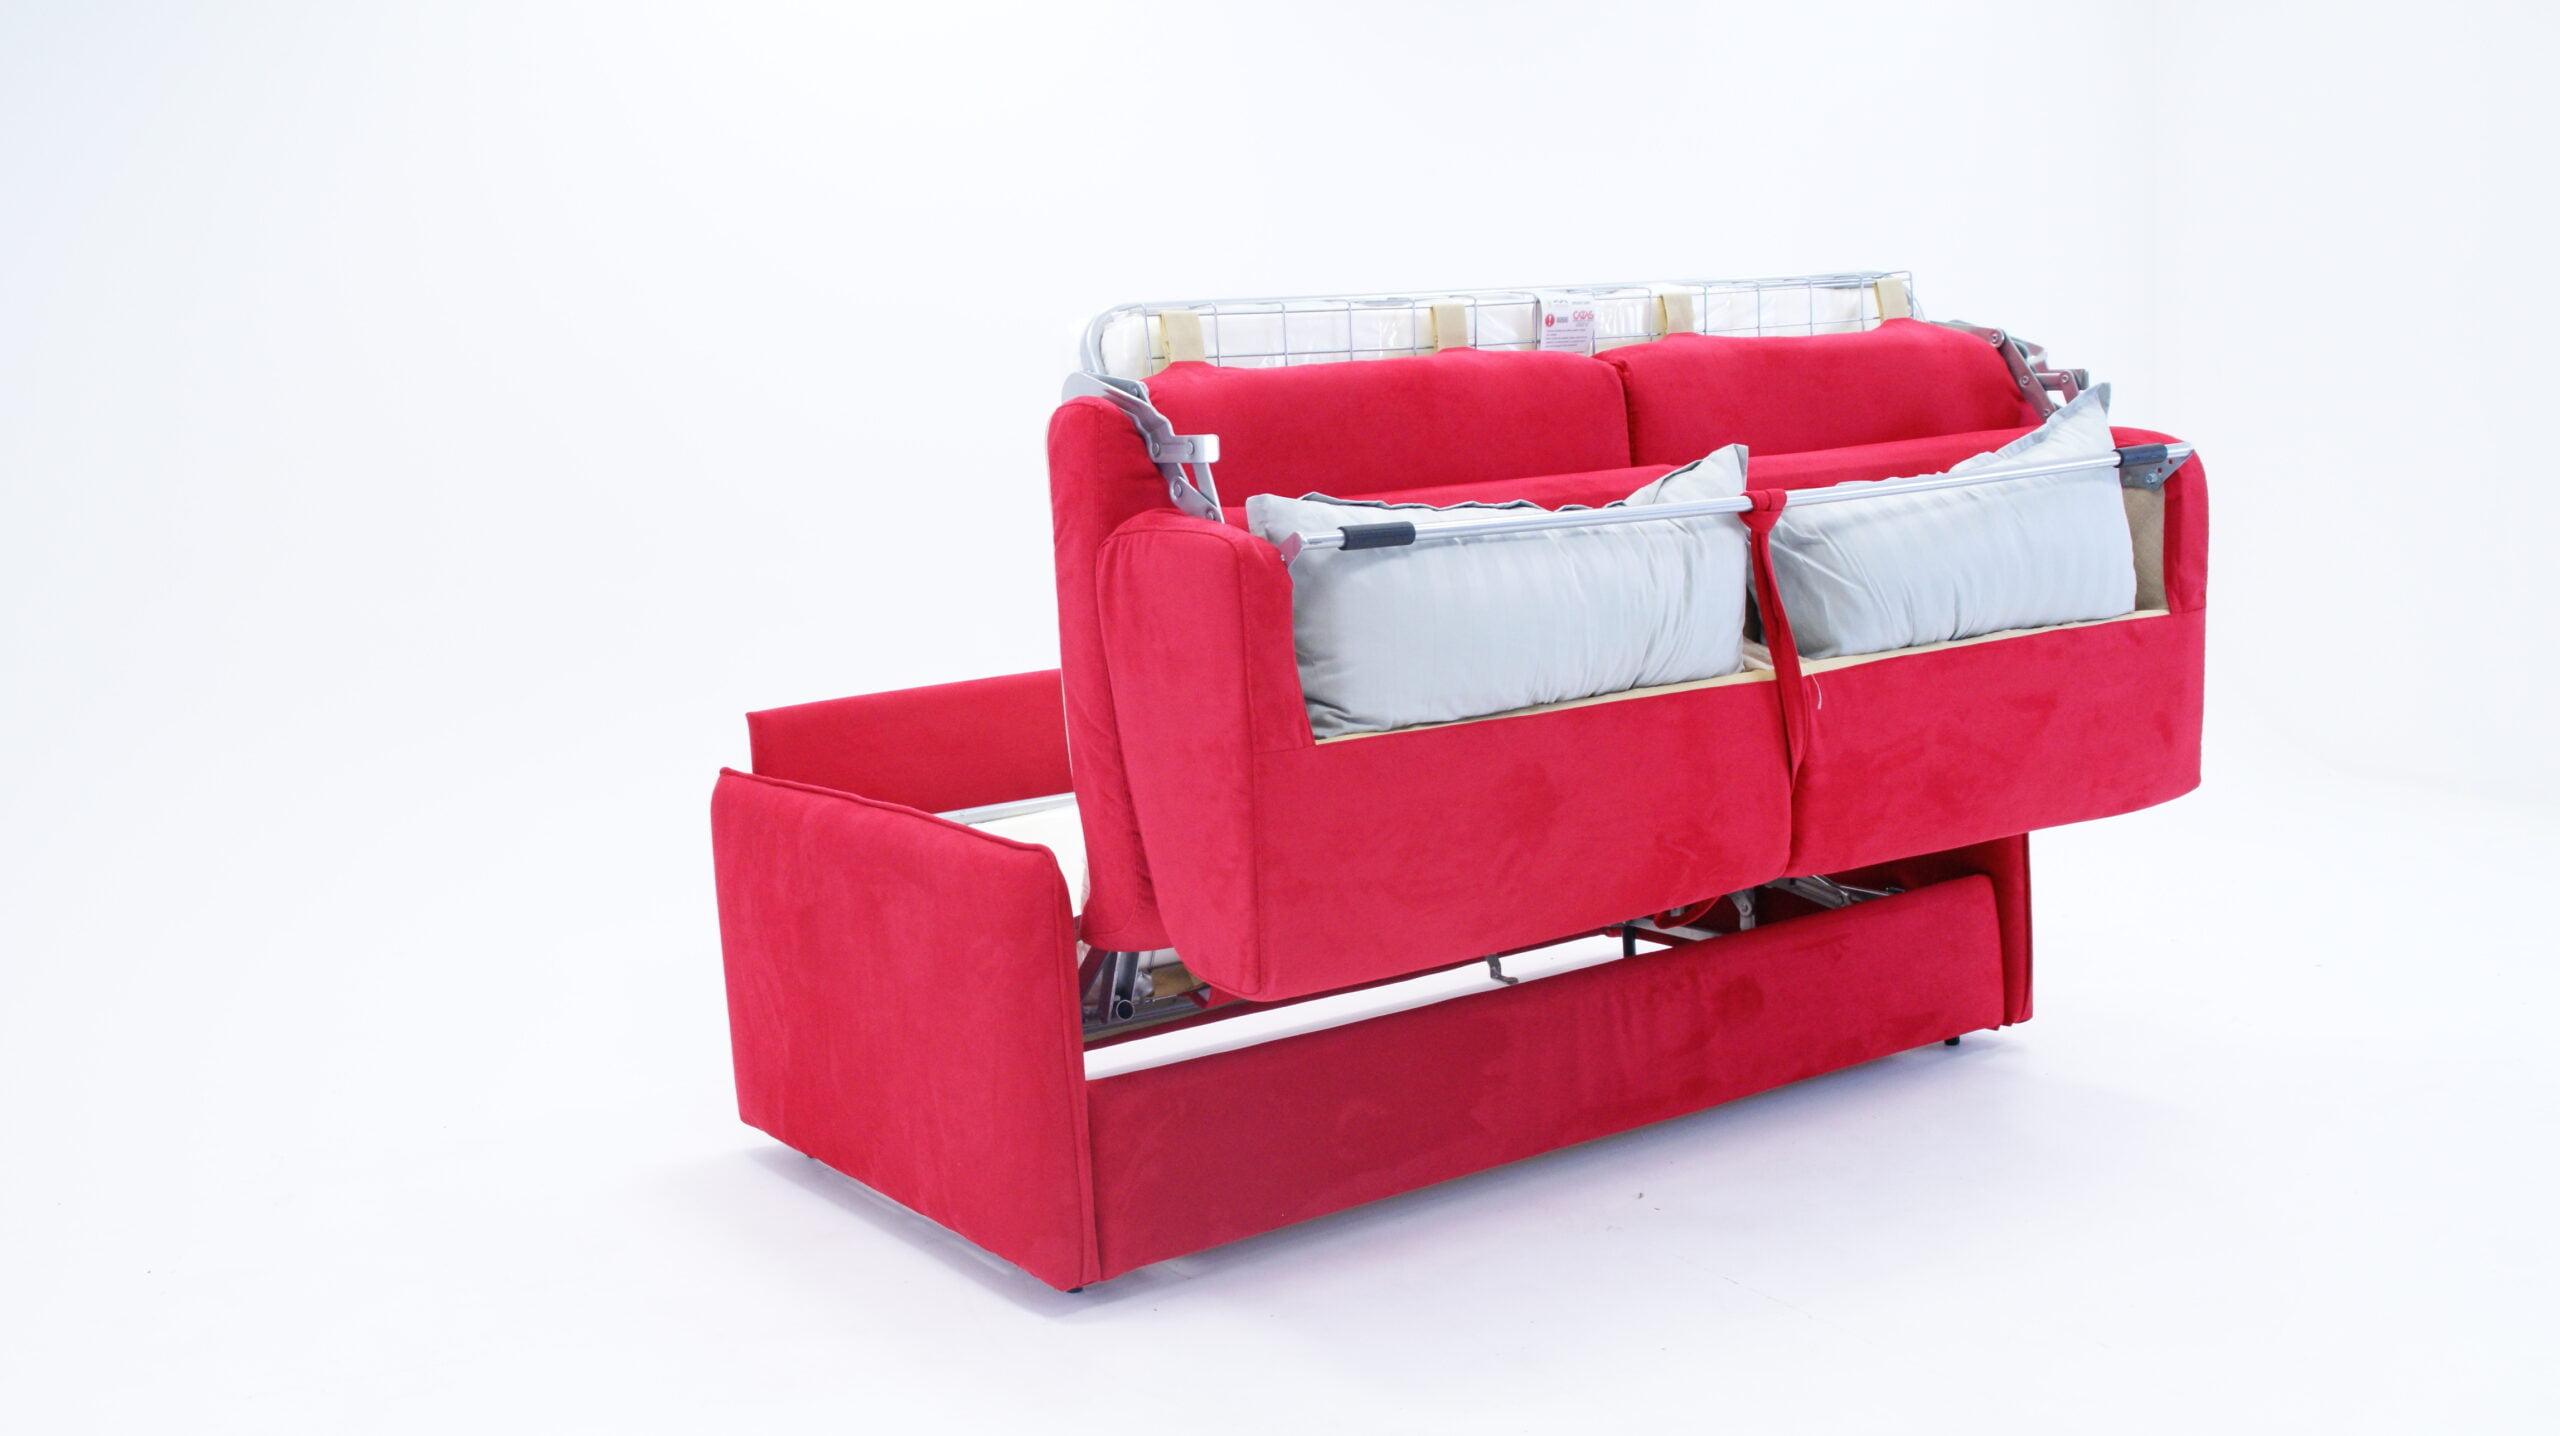 margherita sofa giotto living sofa relax sofa ange sofa sofabed